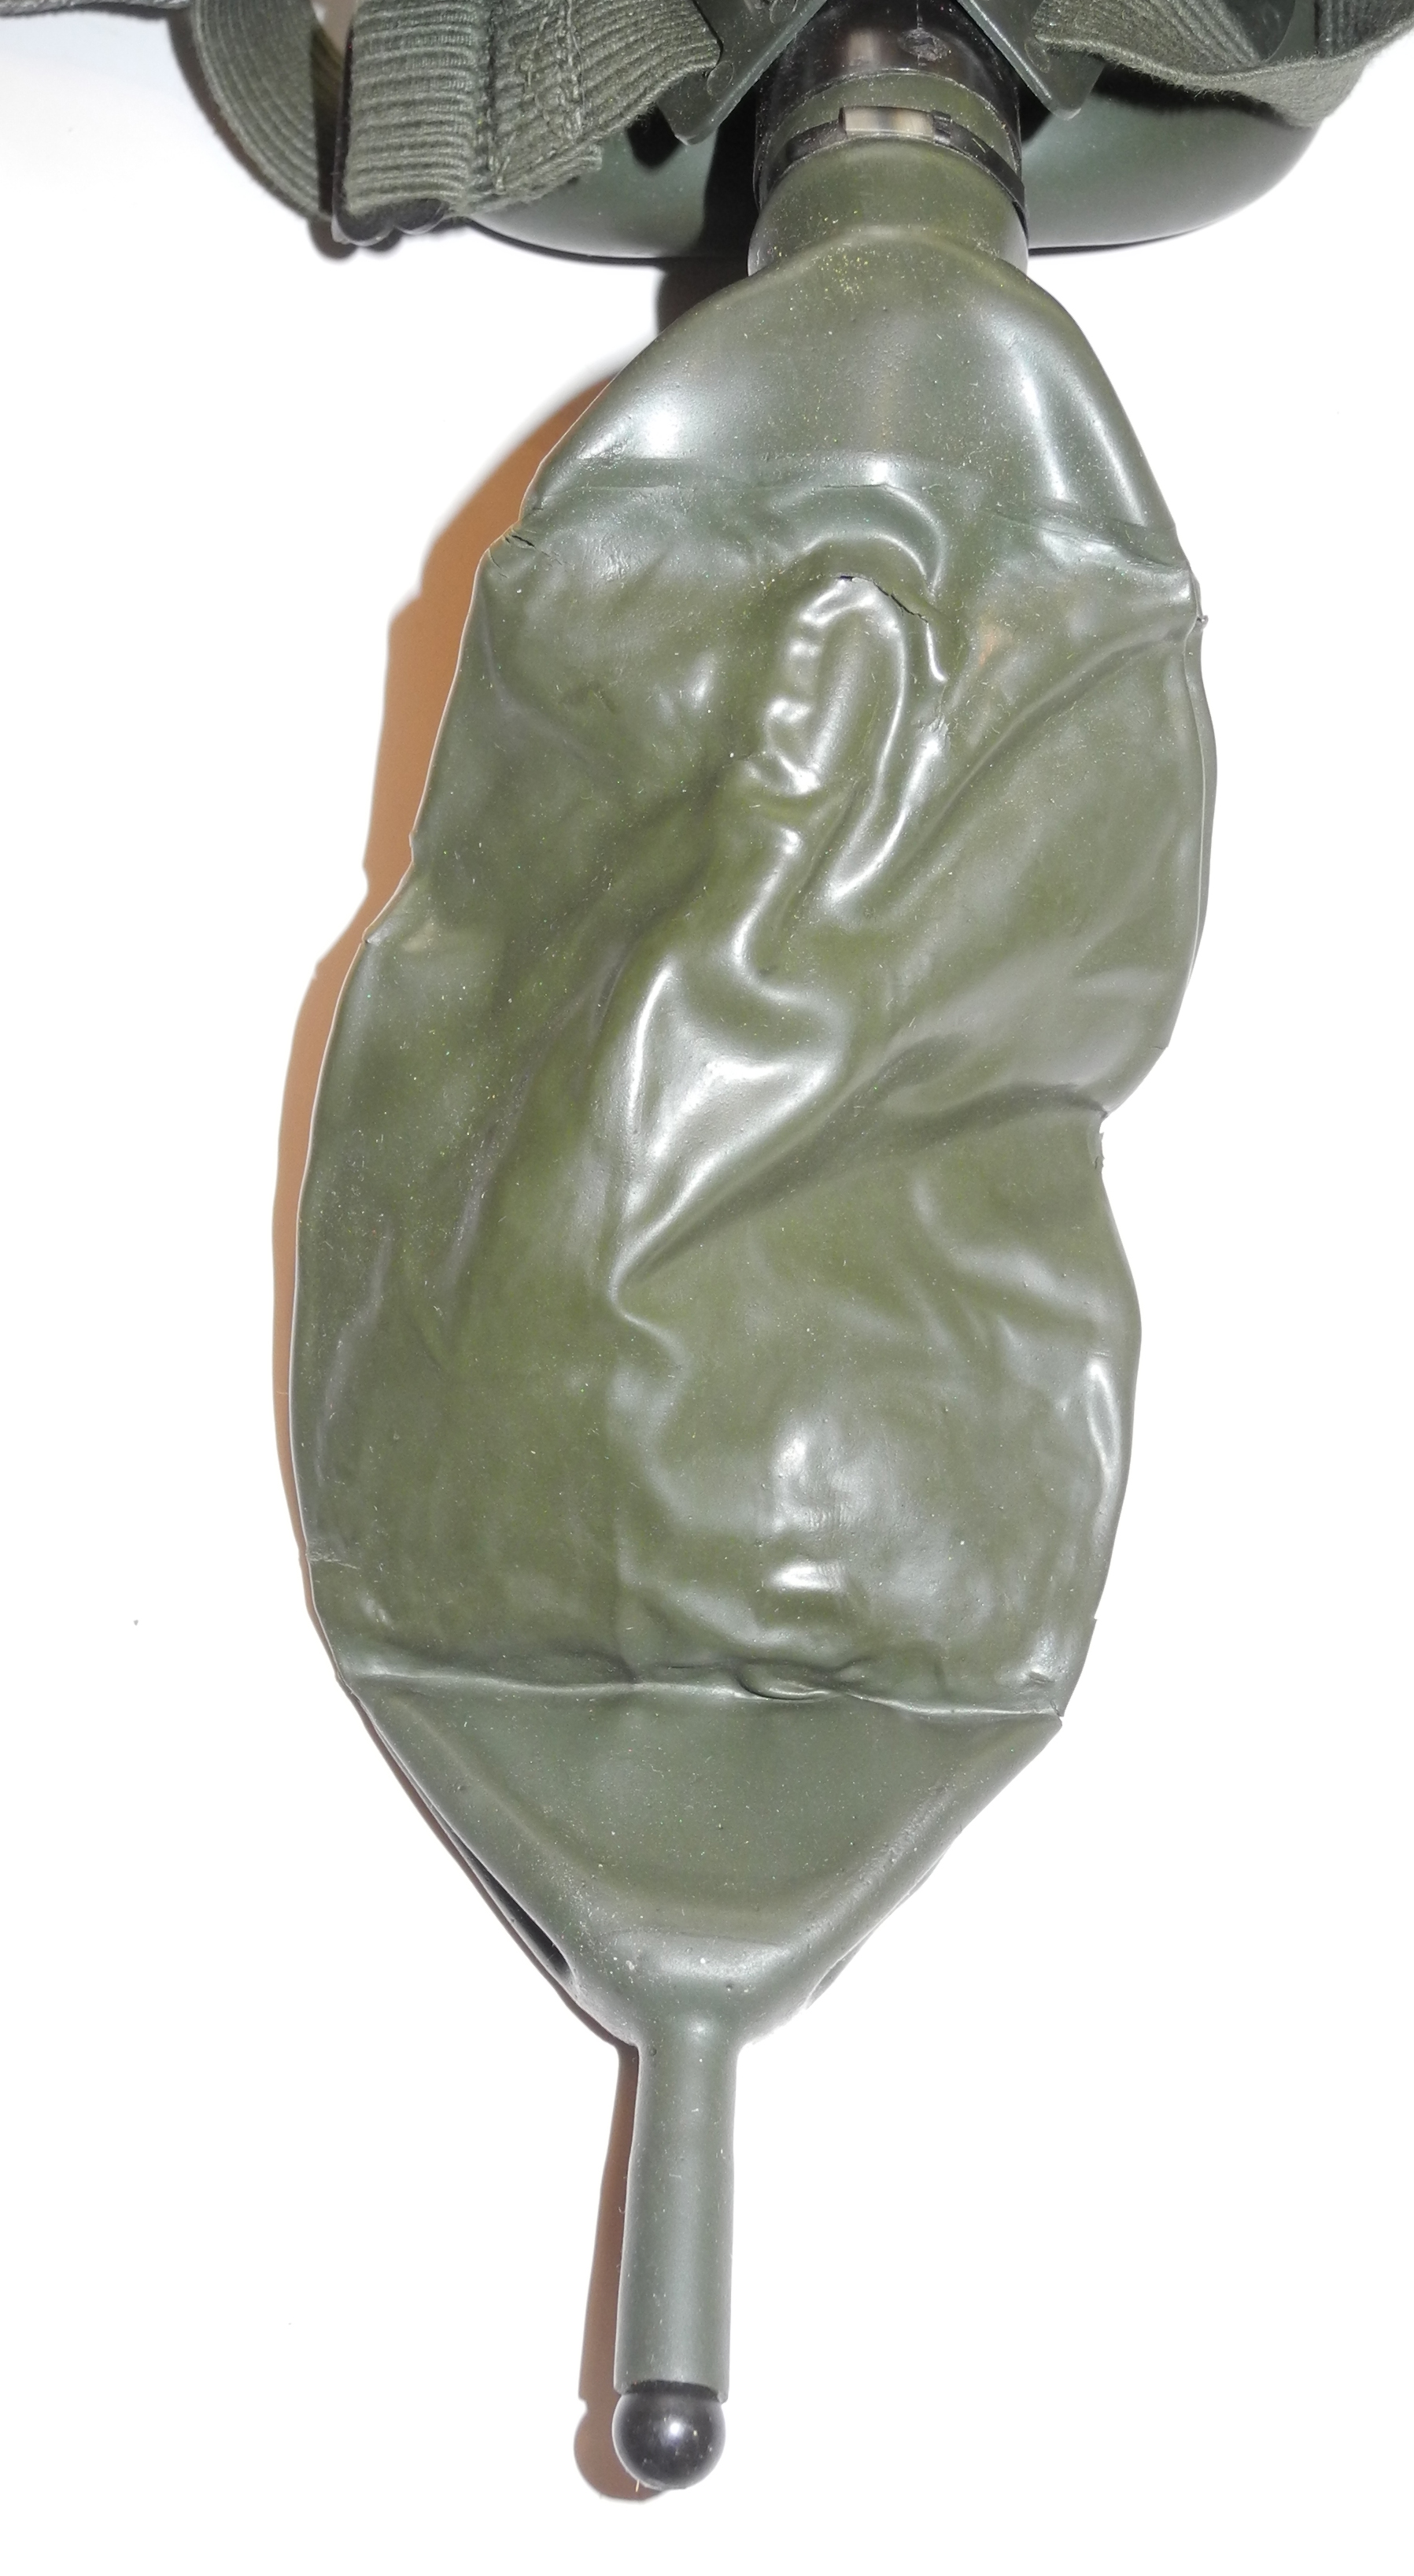 USAF Type A-8B oxygen Mask